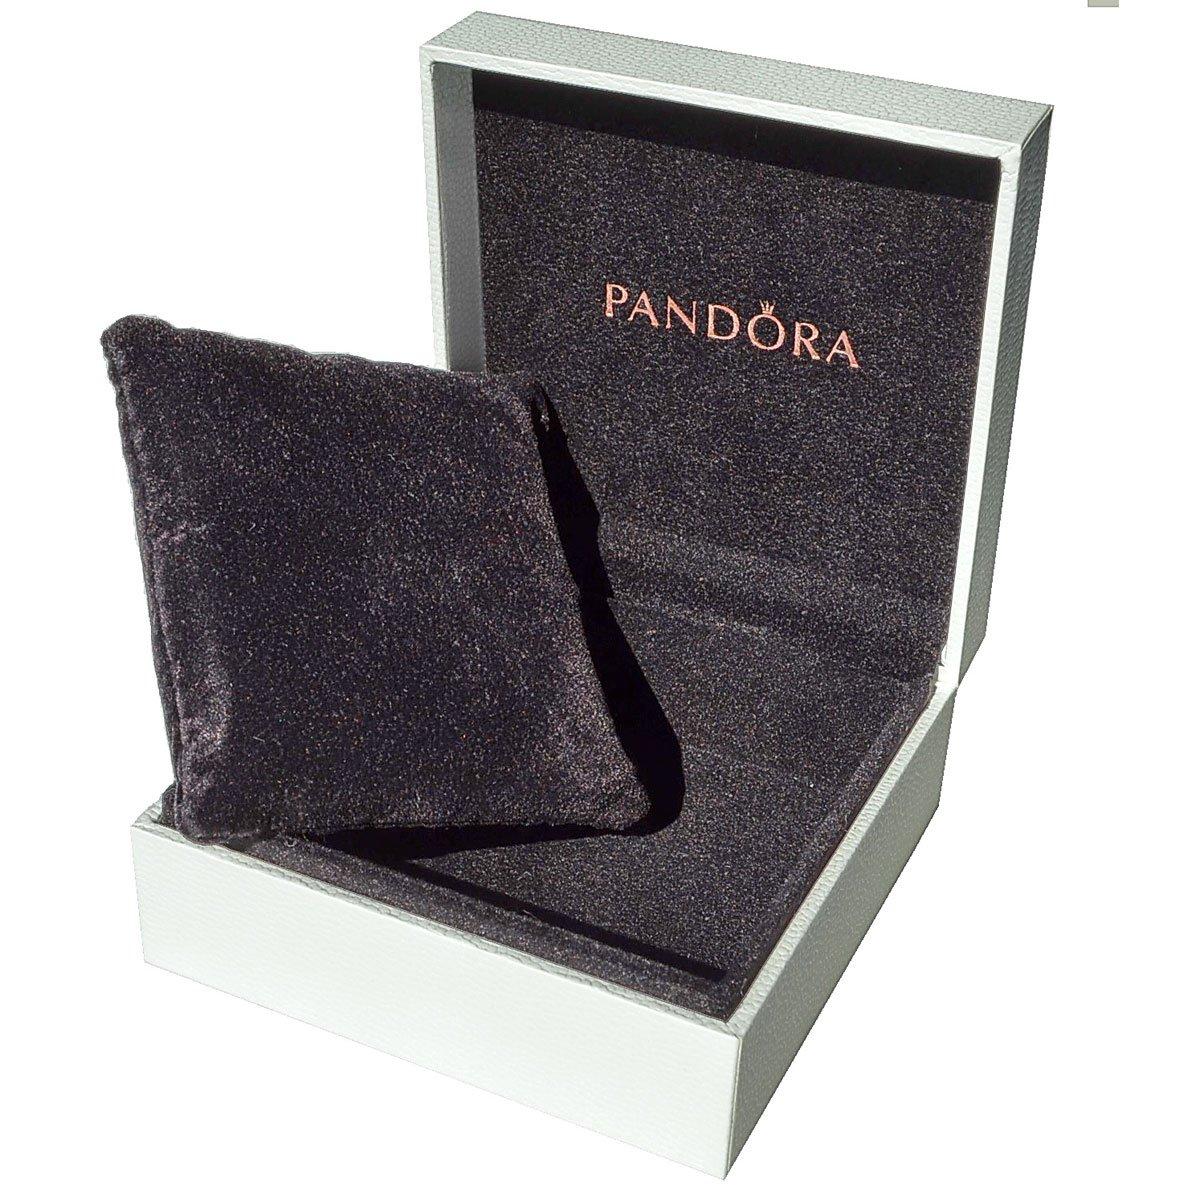 a3d9edb1c1 Pandora White Gift Box, Small: Amazon.co.uk: Jewellery